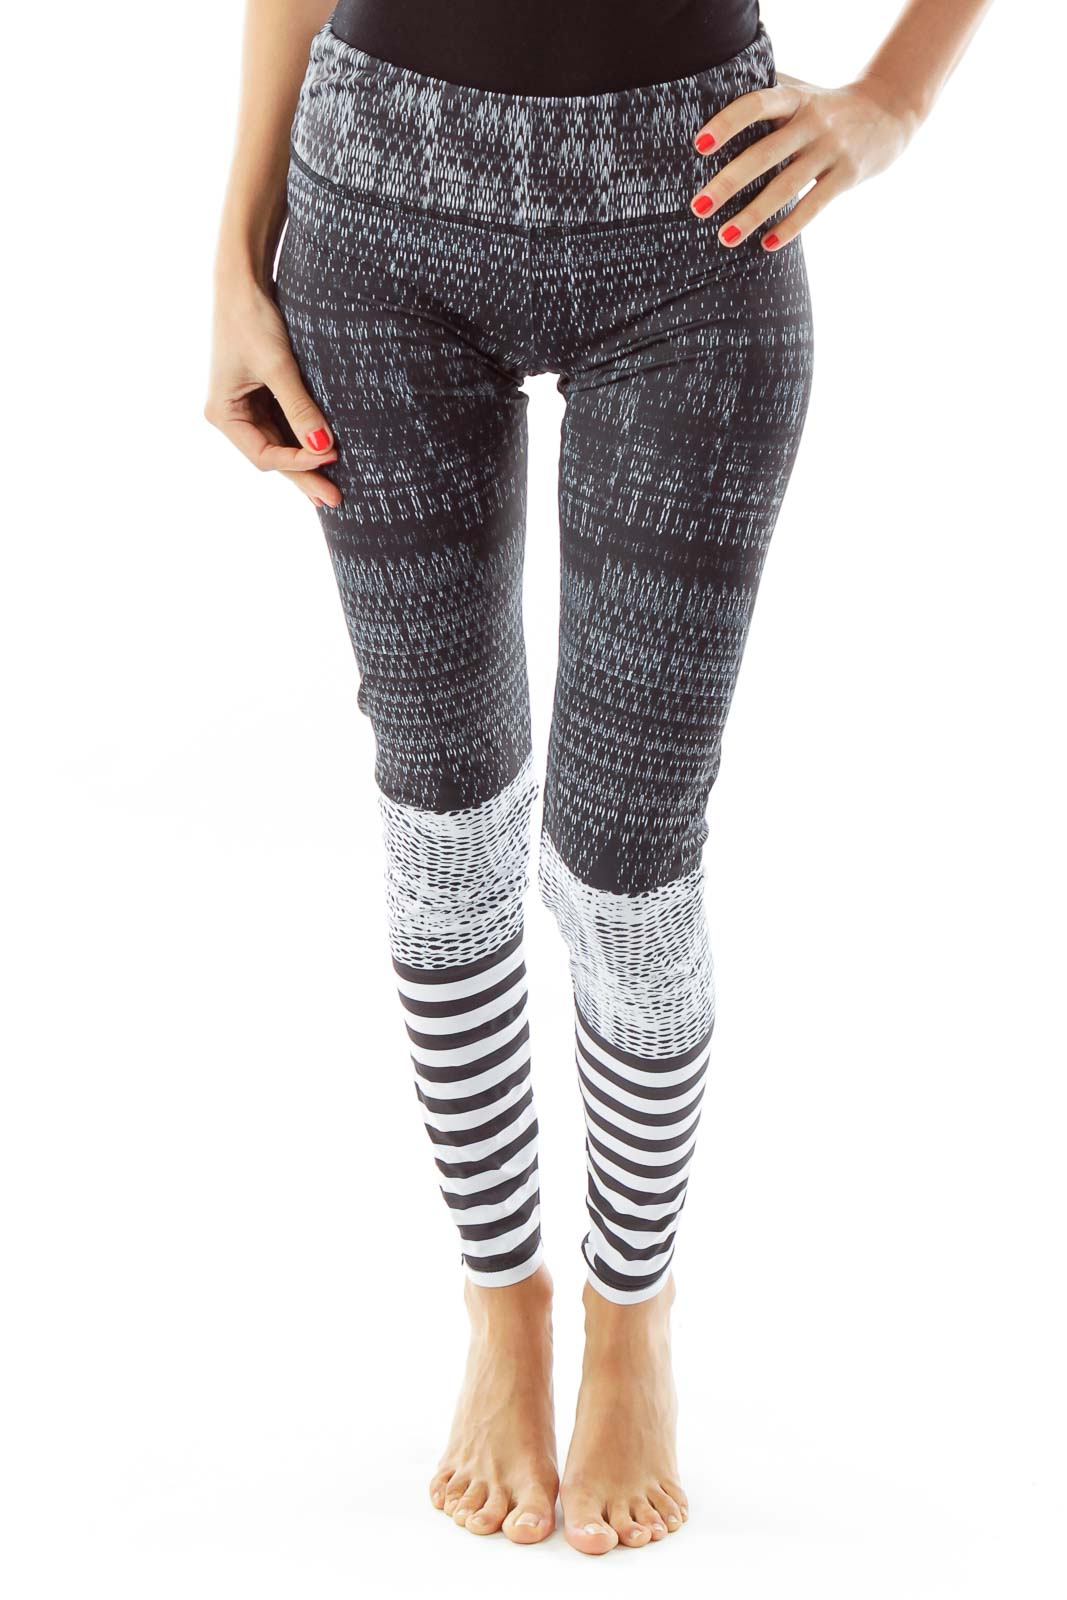 d30c9688a1 Shop Black White Striped Yoga Pants clothing and handbags at ...